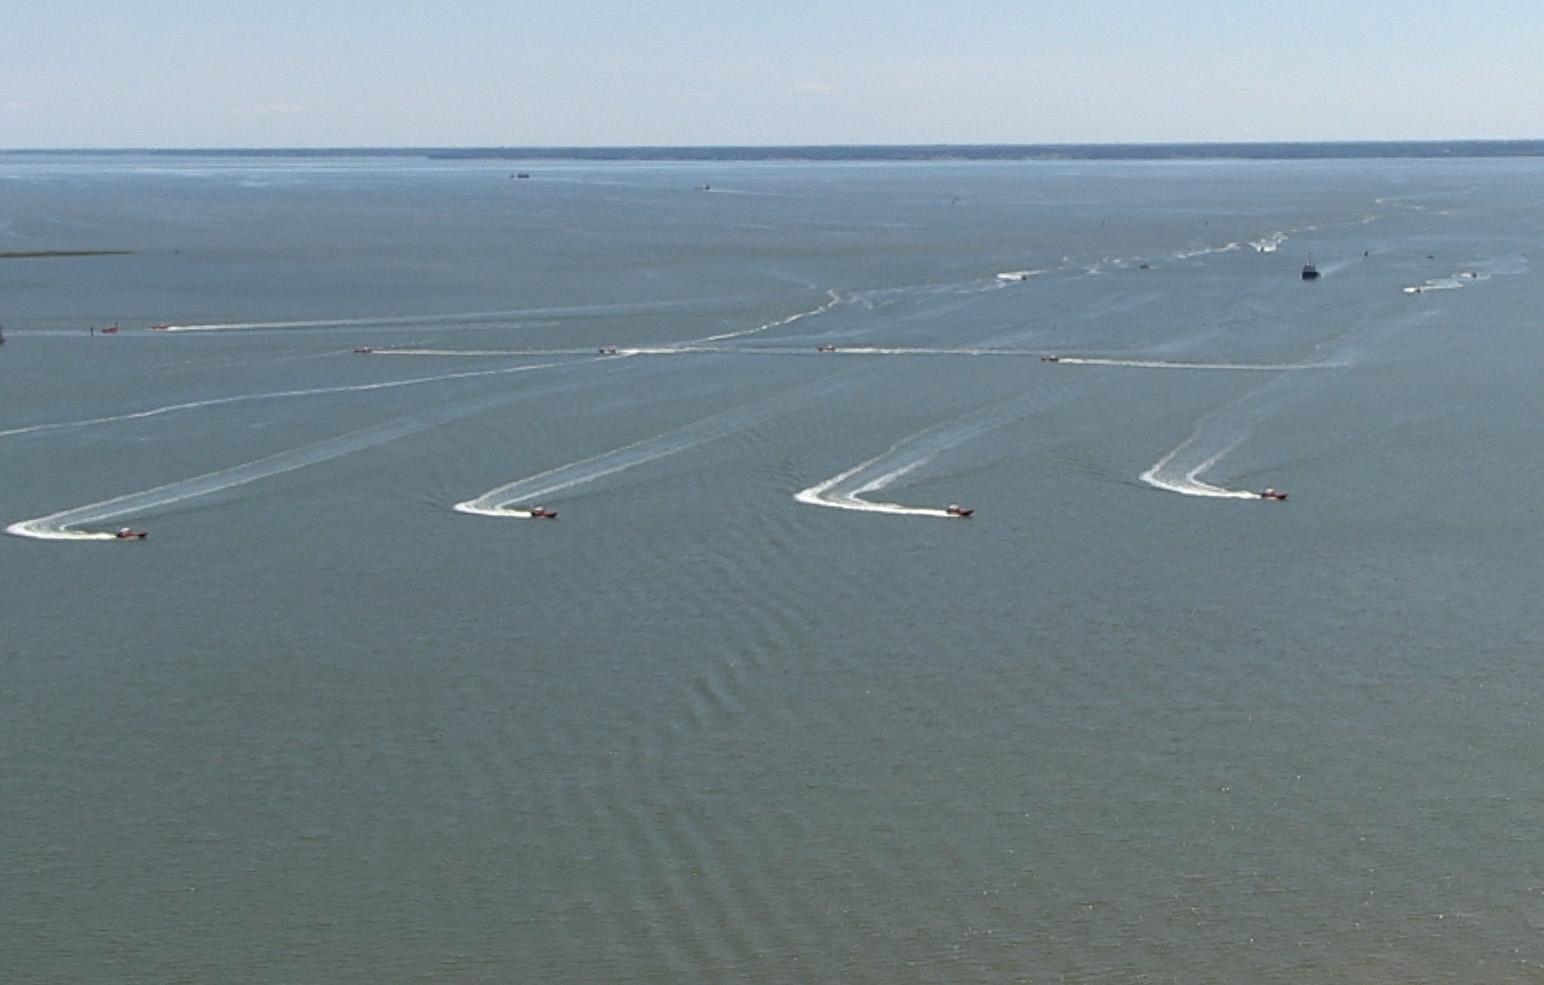 Unmanned Naval watercraft operating under swarm intelligence programming.  Image Credit: DefenseTech.org